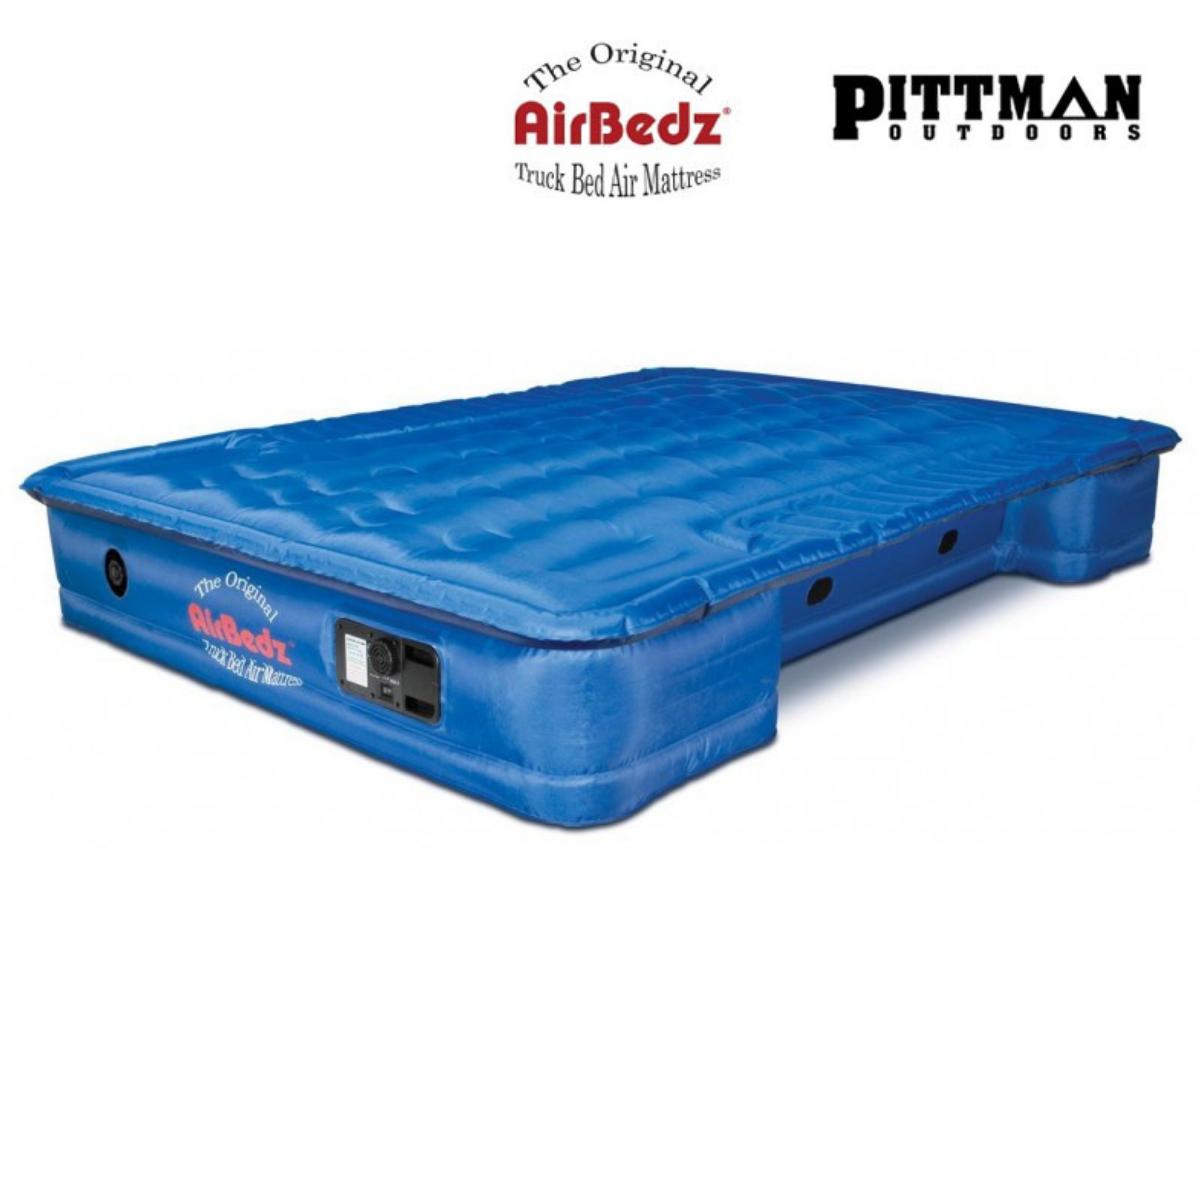 AirBedz Original Truck Bed Air Mattresses